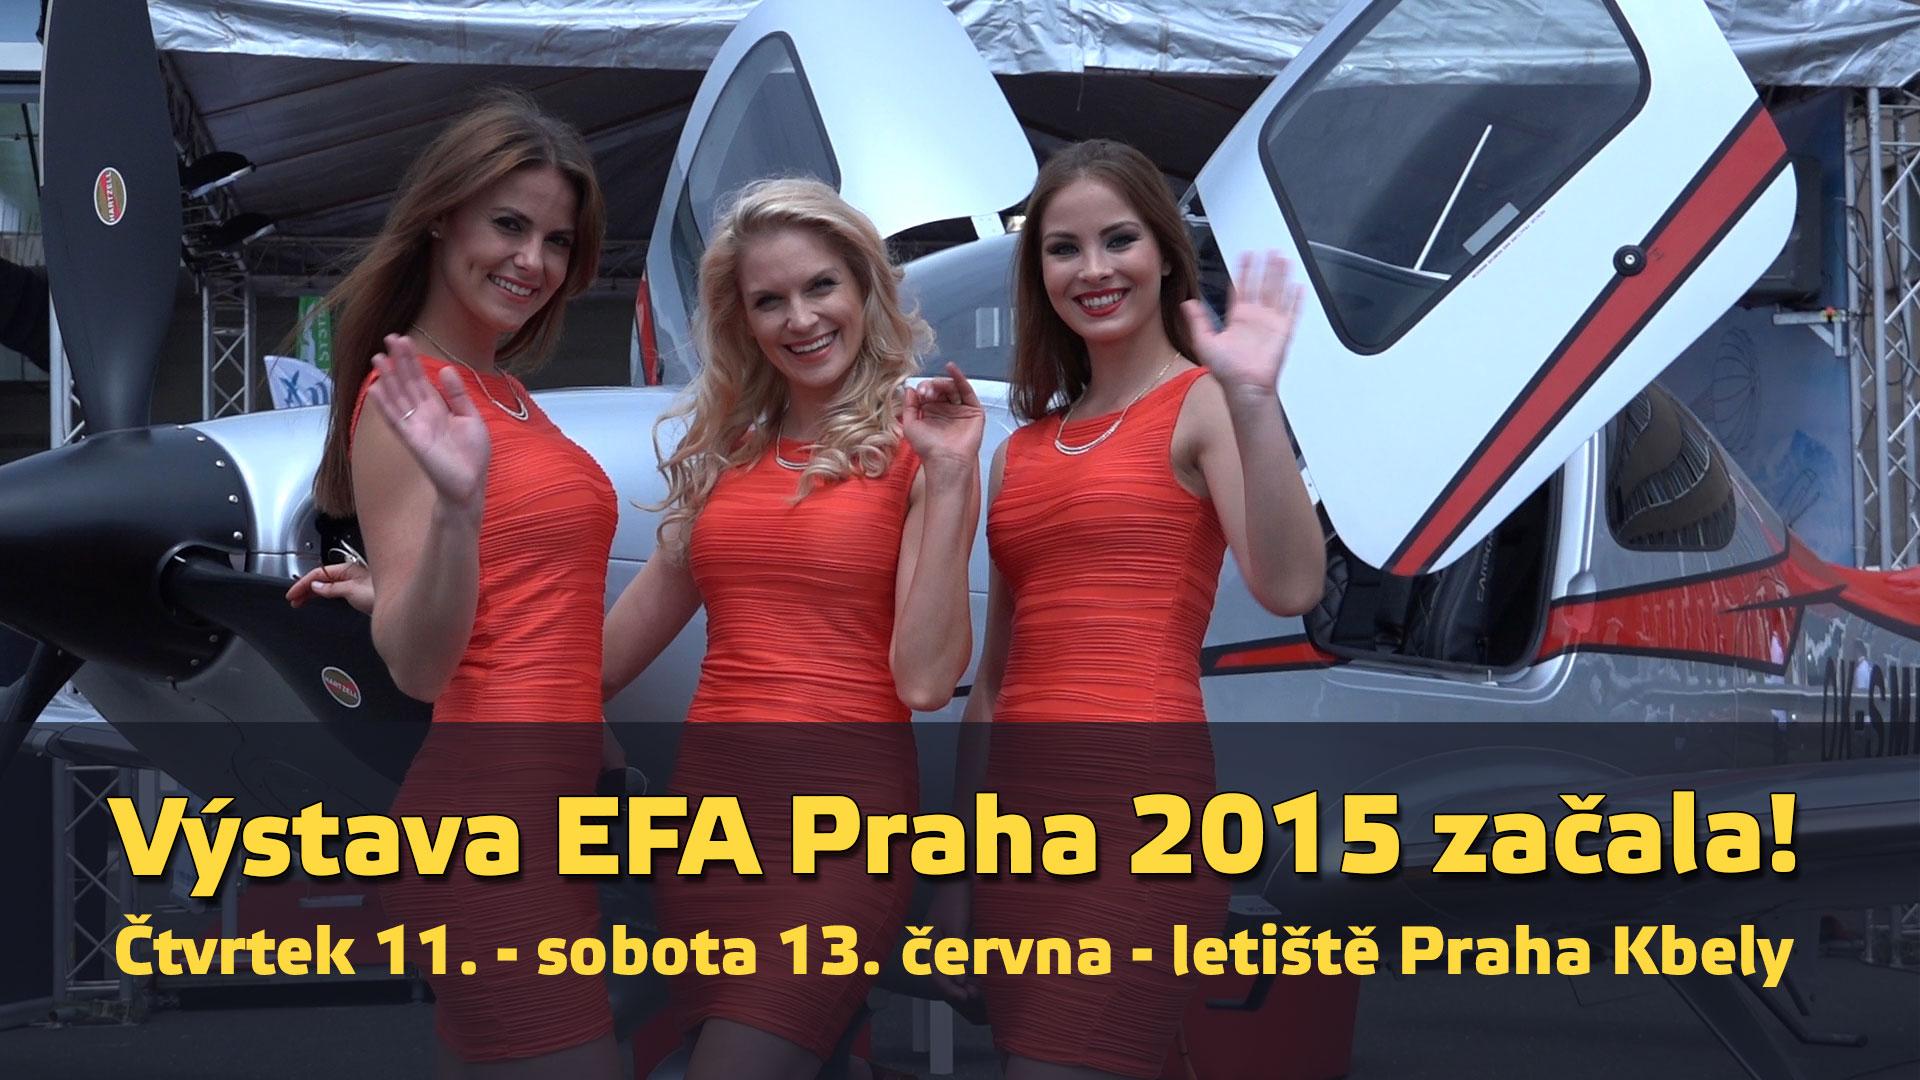 Pozvánka na EFA Prague 2015